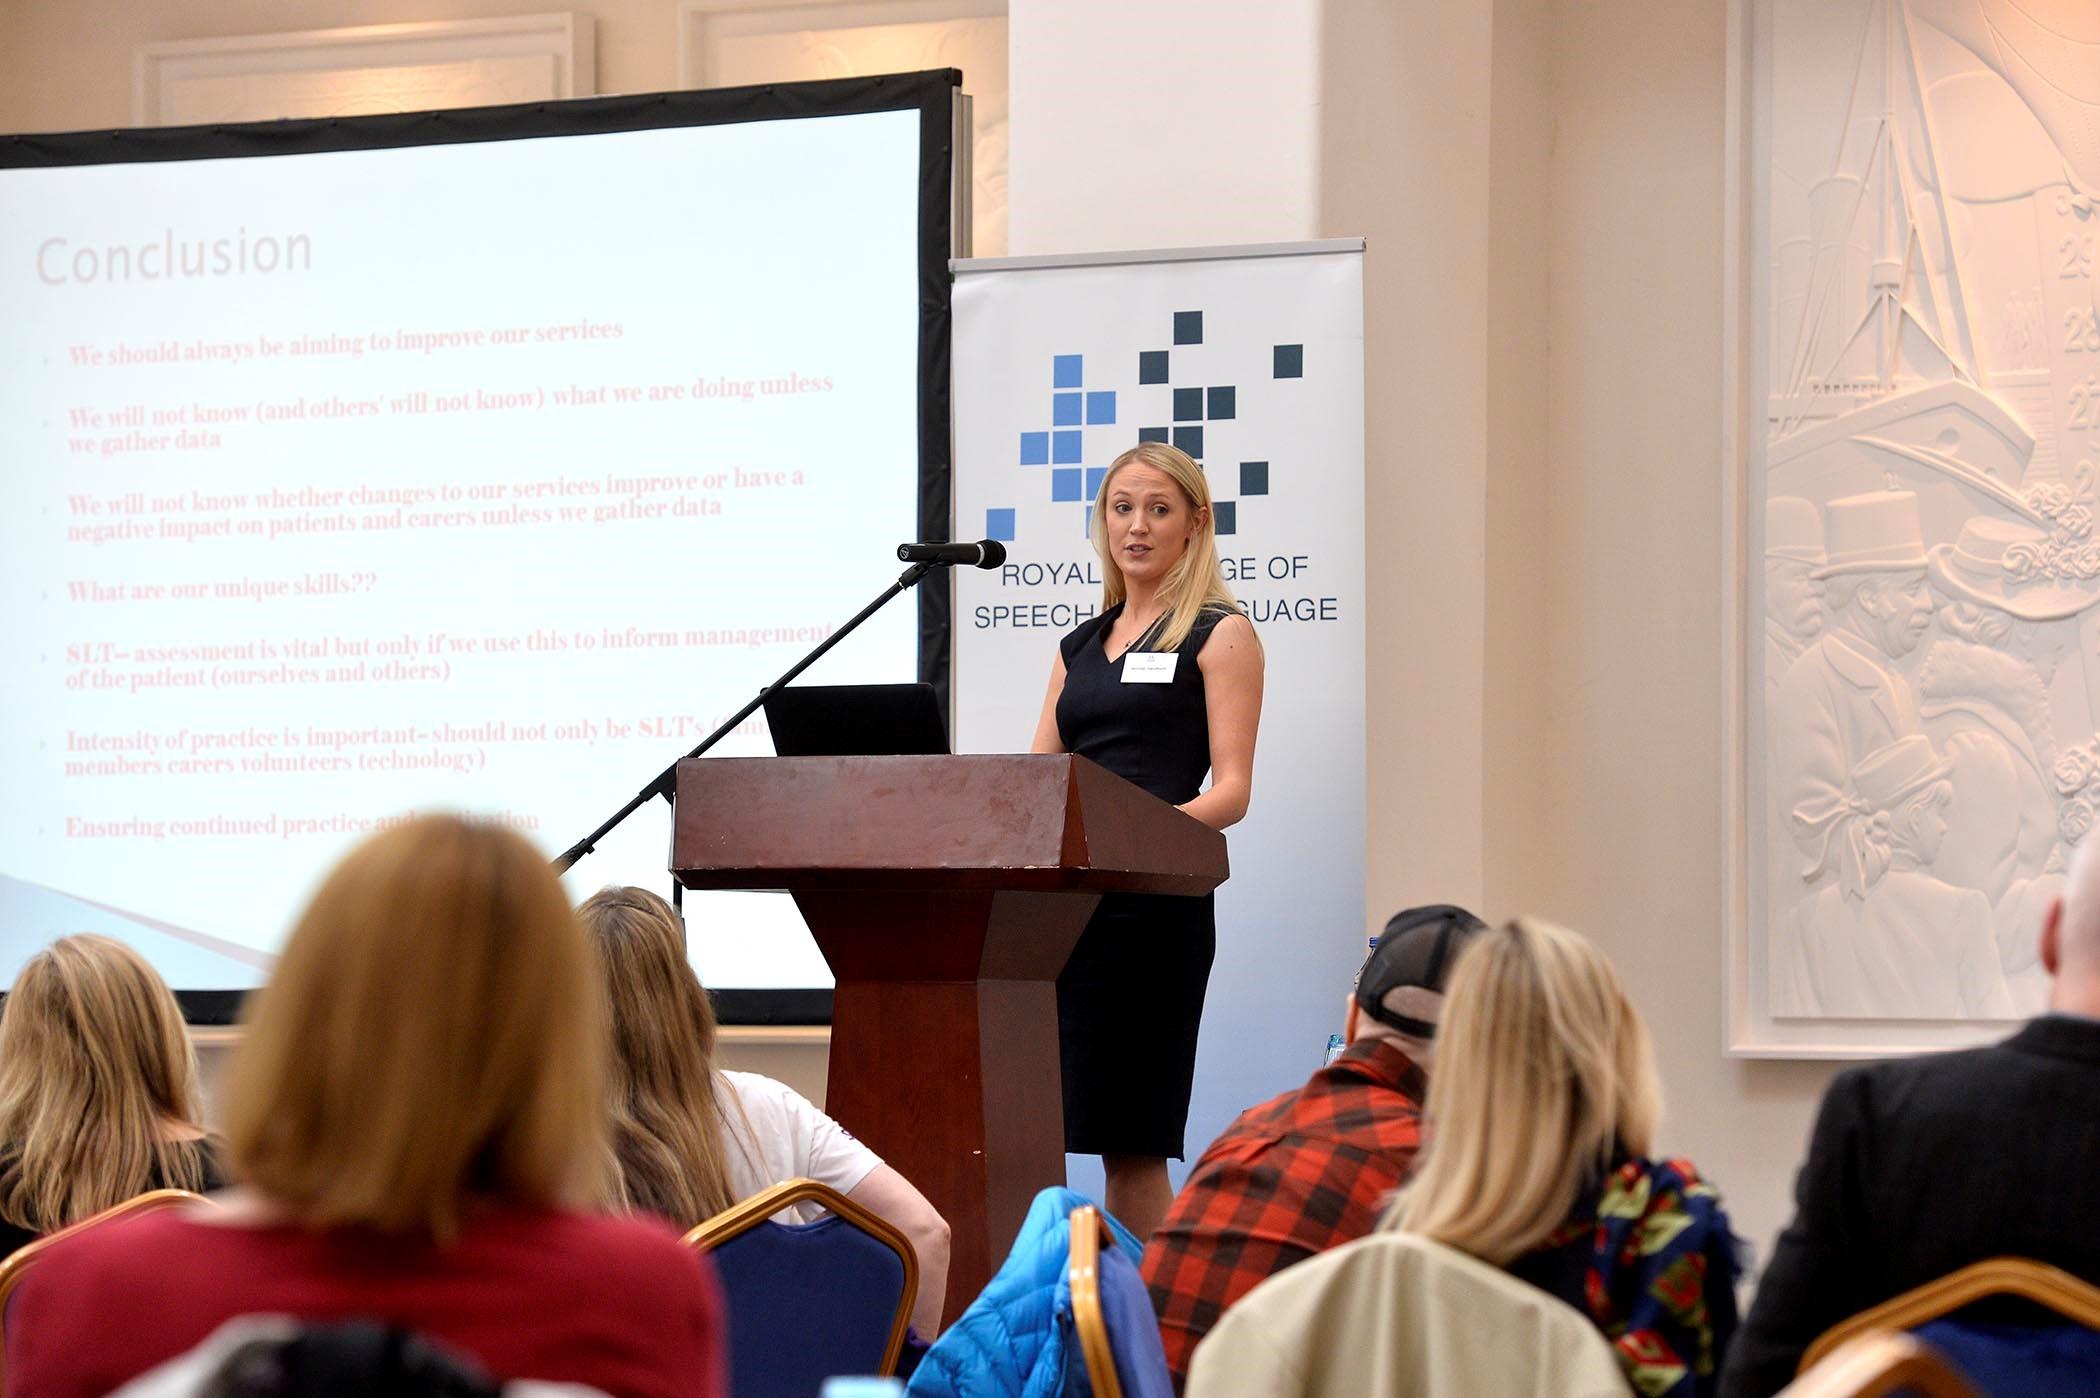 Speech & Language Therapist Jennifer Handforth at the RSCLT event in Belfast